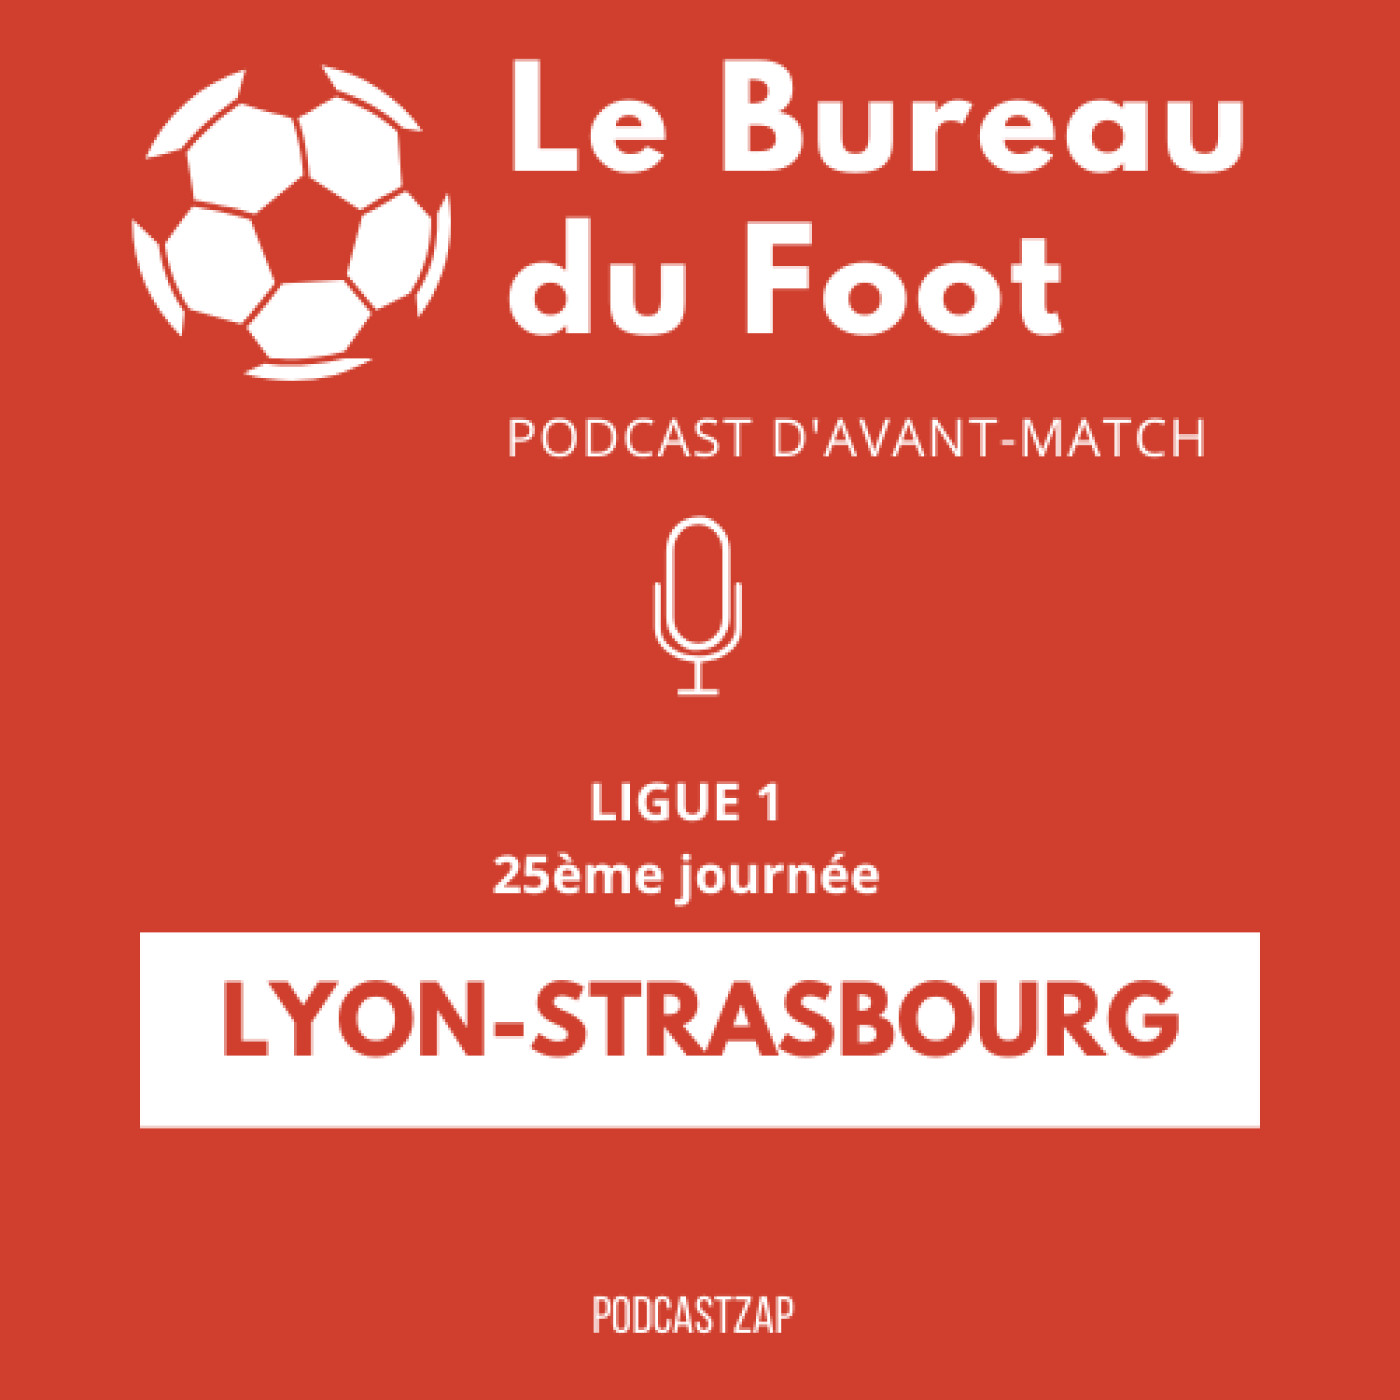 S1E04 - Ligue 1 - Journée 25 - Lyon-Strasbourg